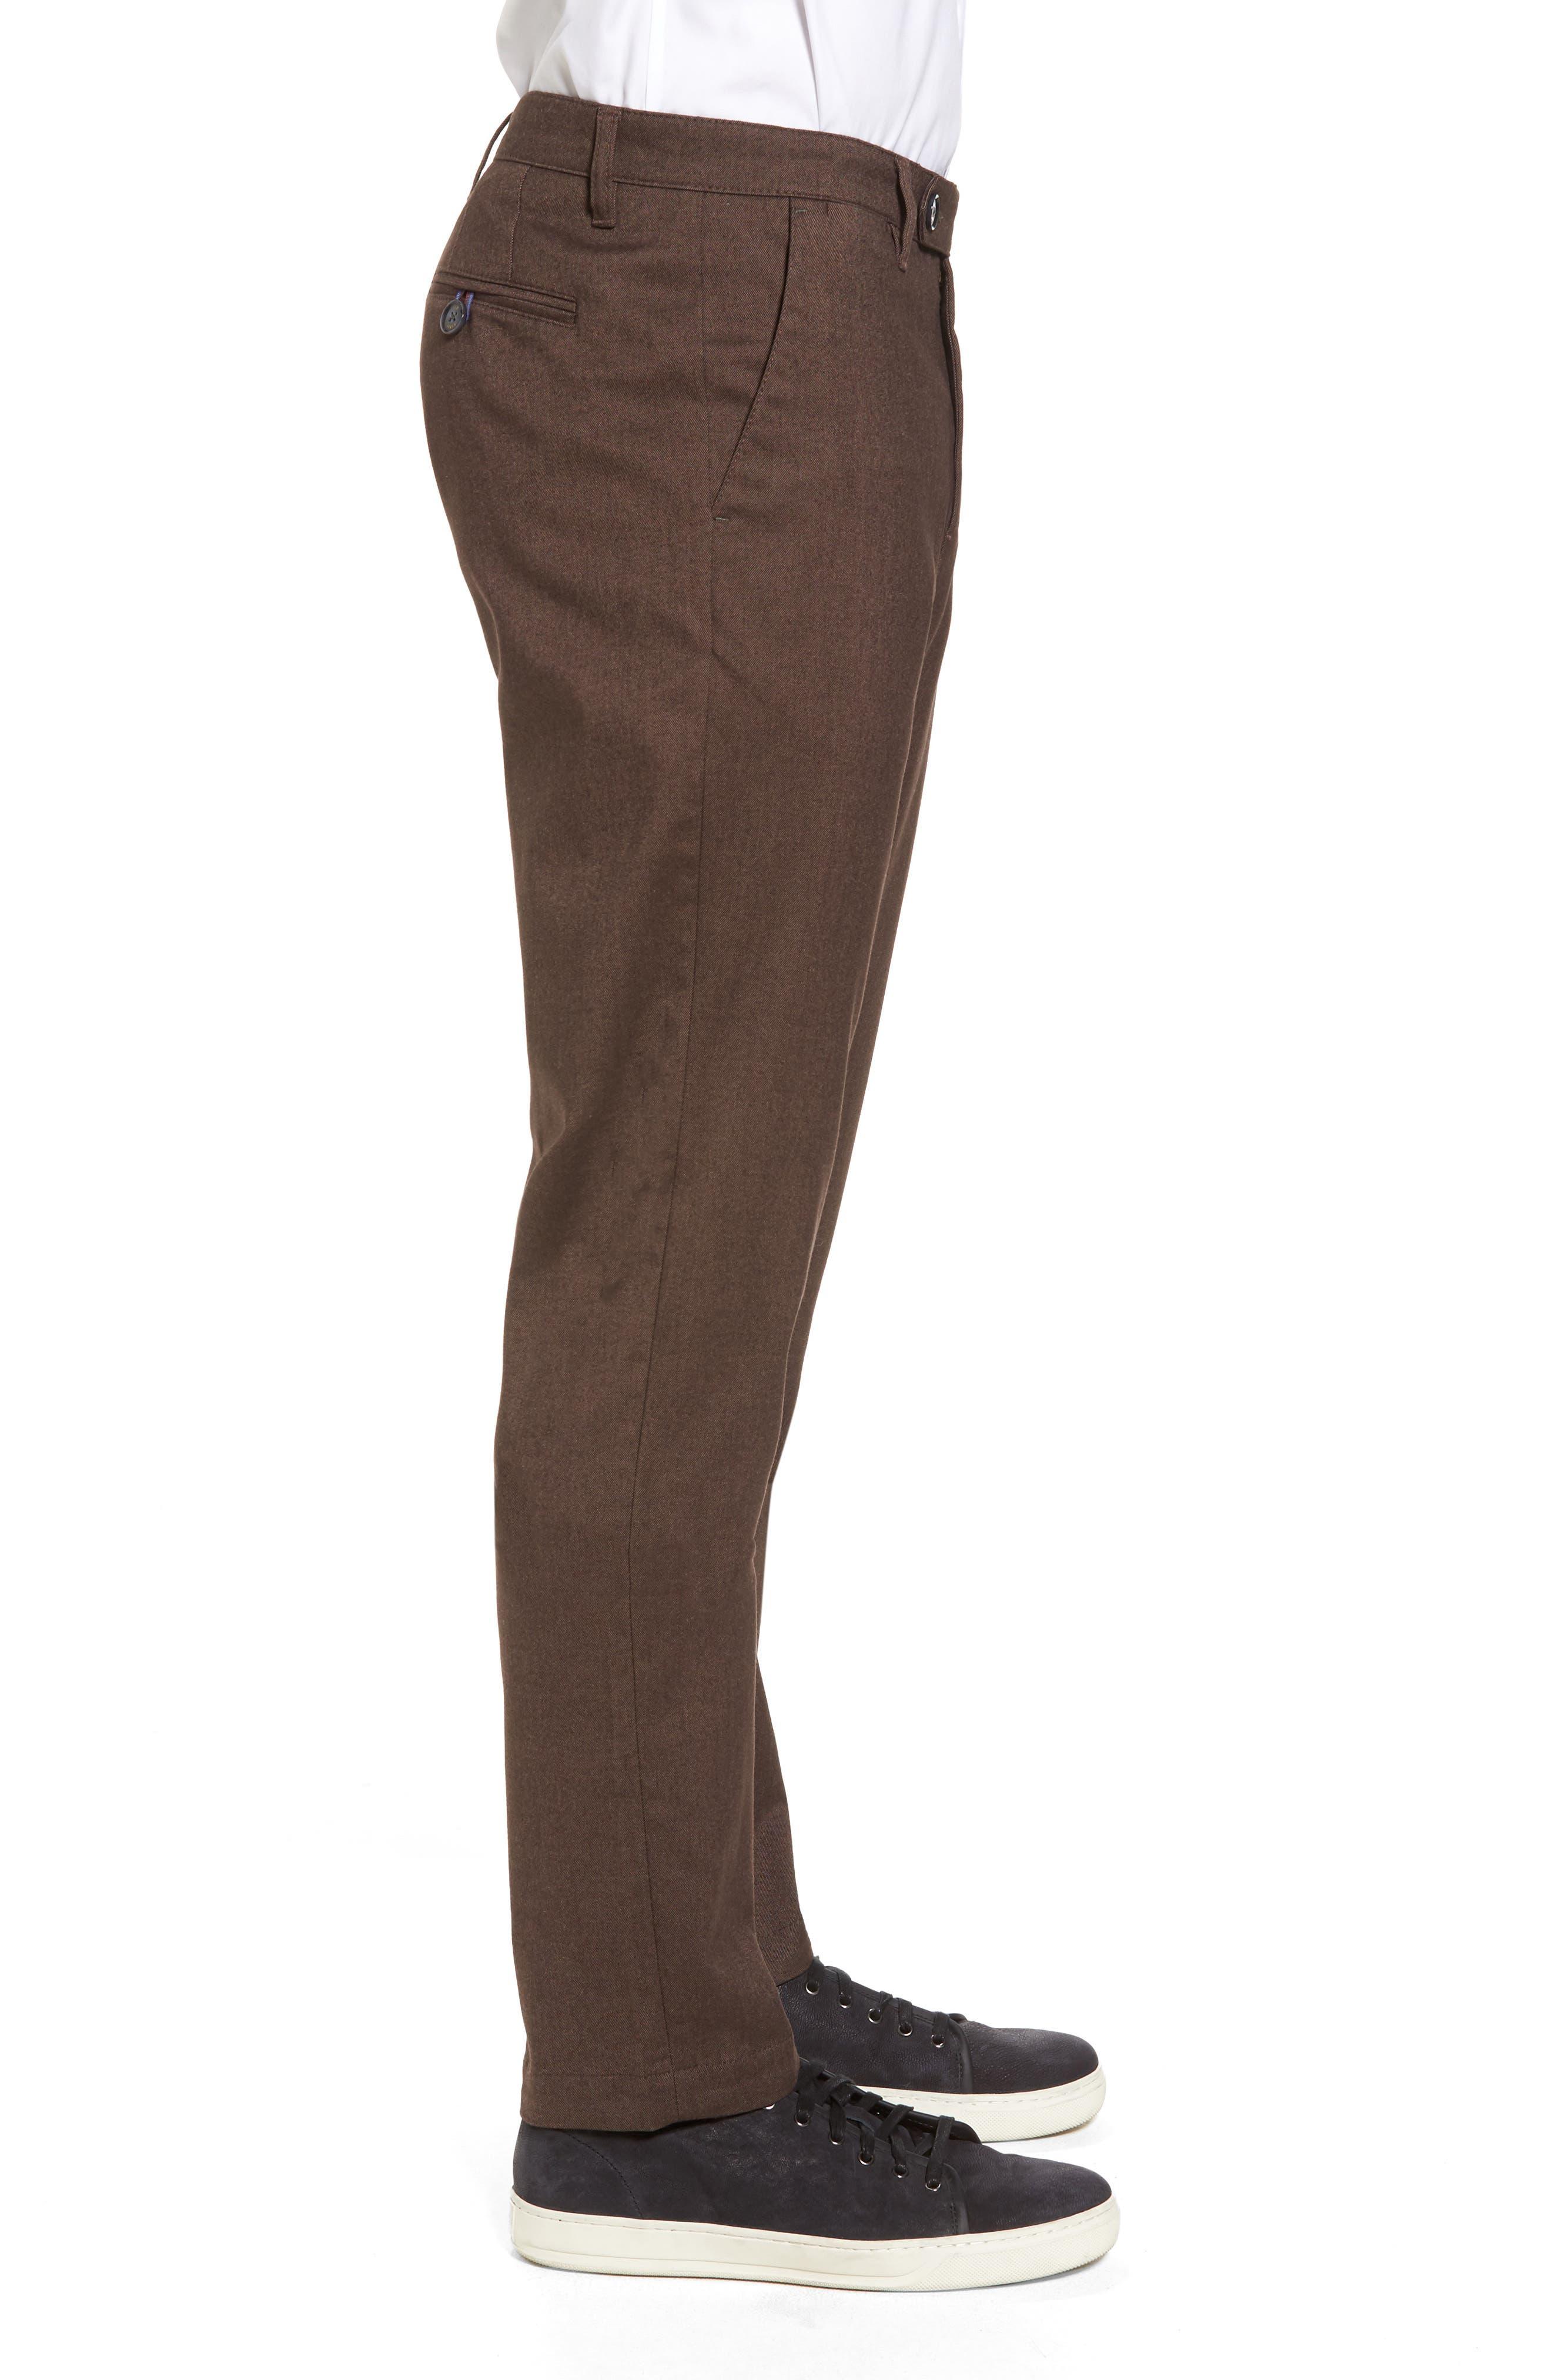 Freshman Modern Fit Brushed Pants,                             Alternate thumbnail 3, color,                             214